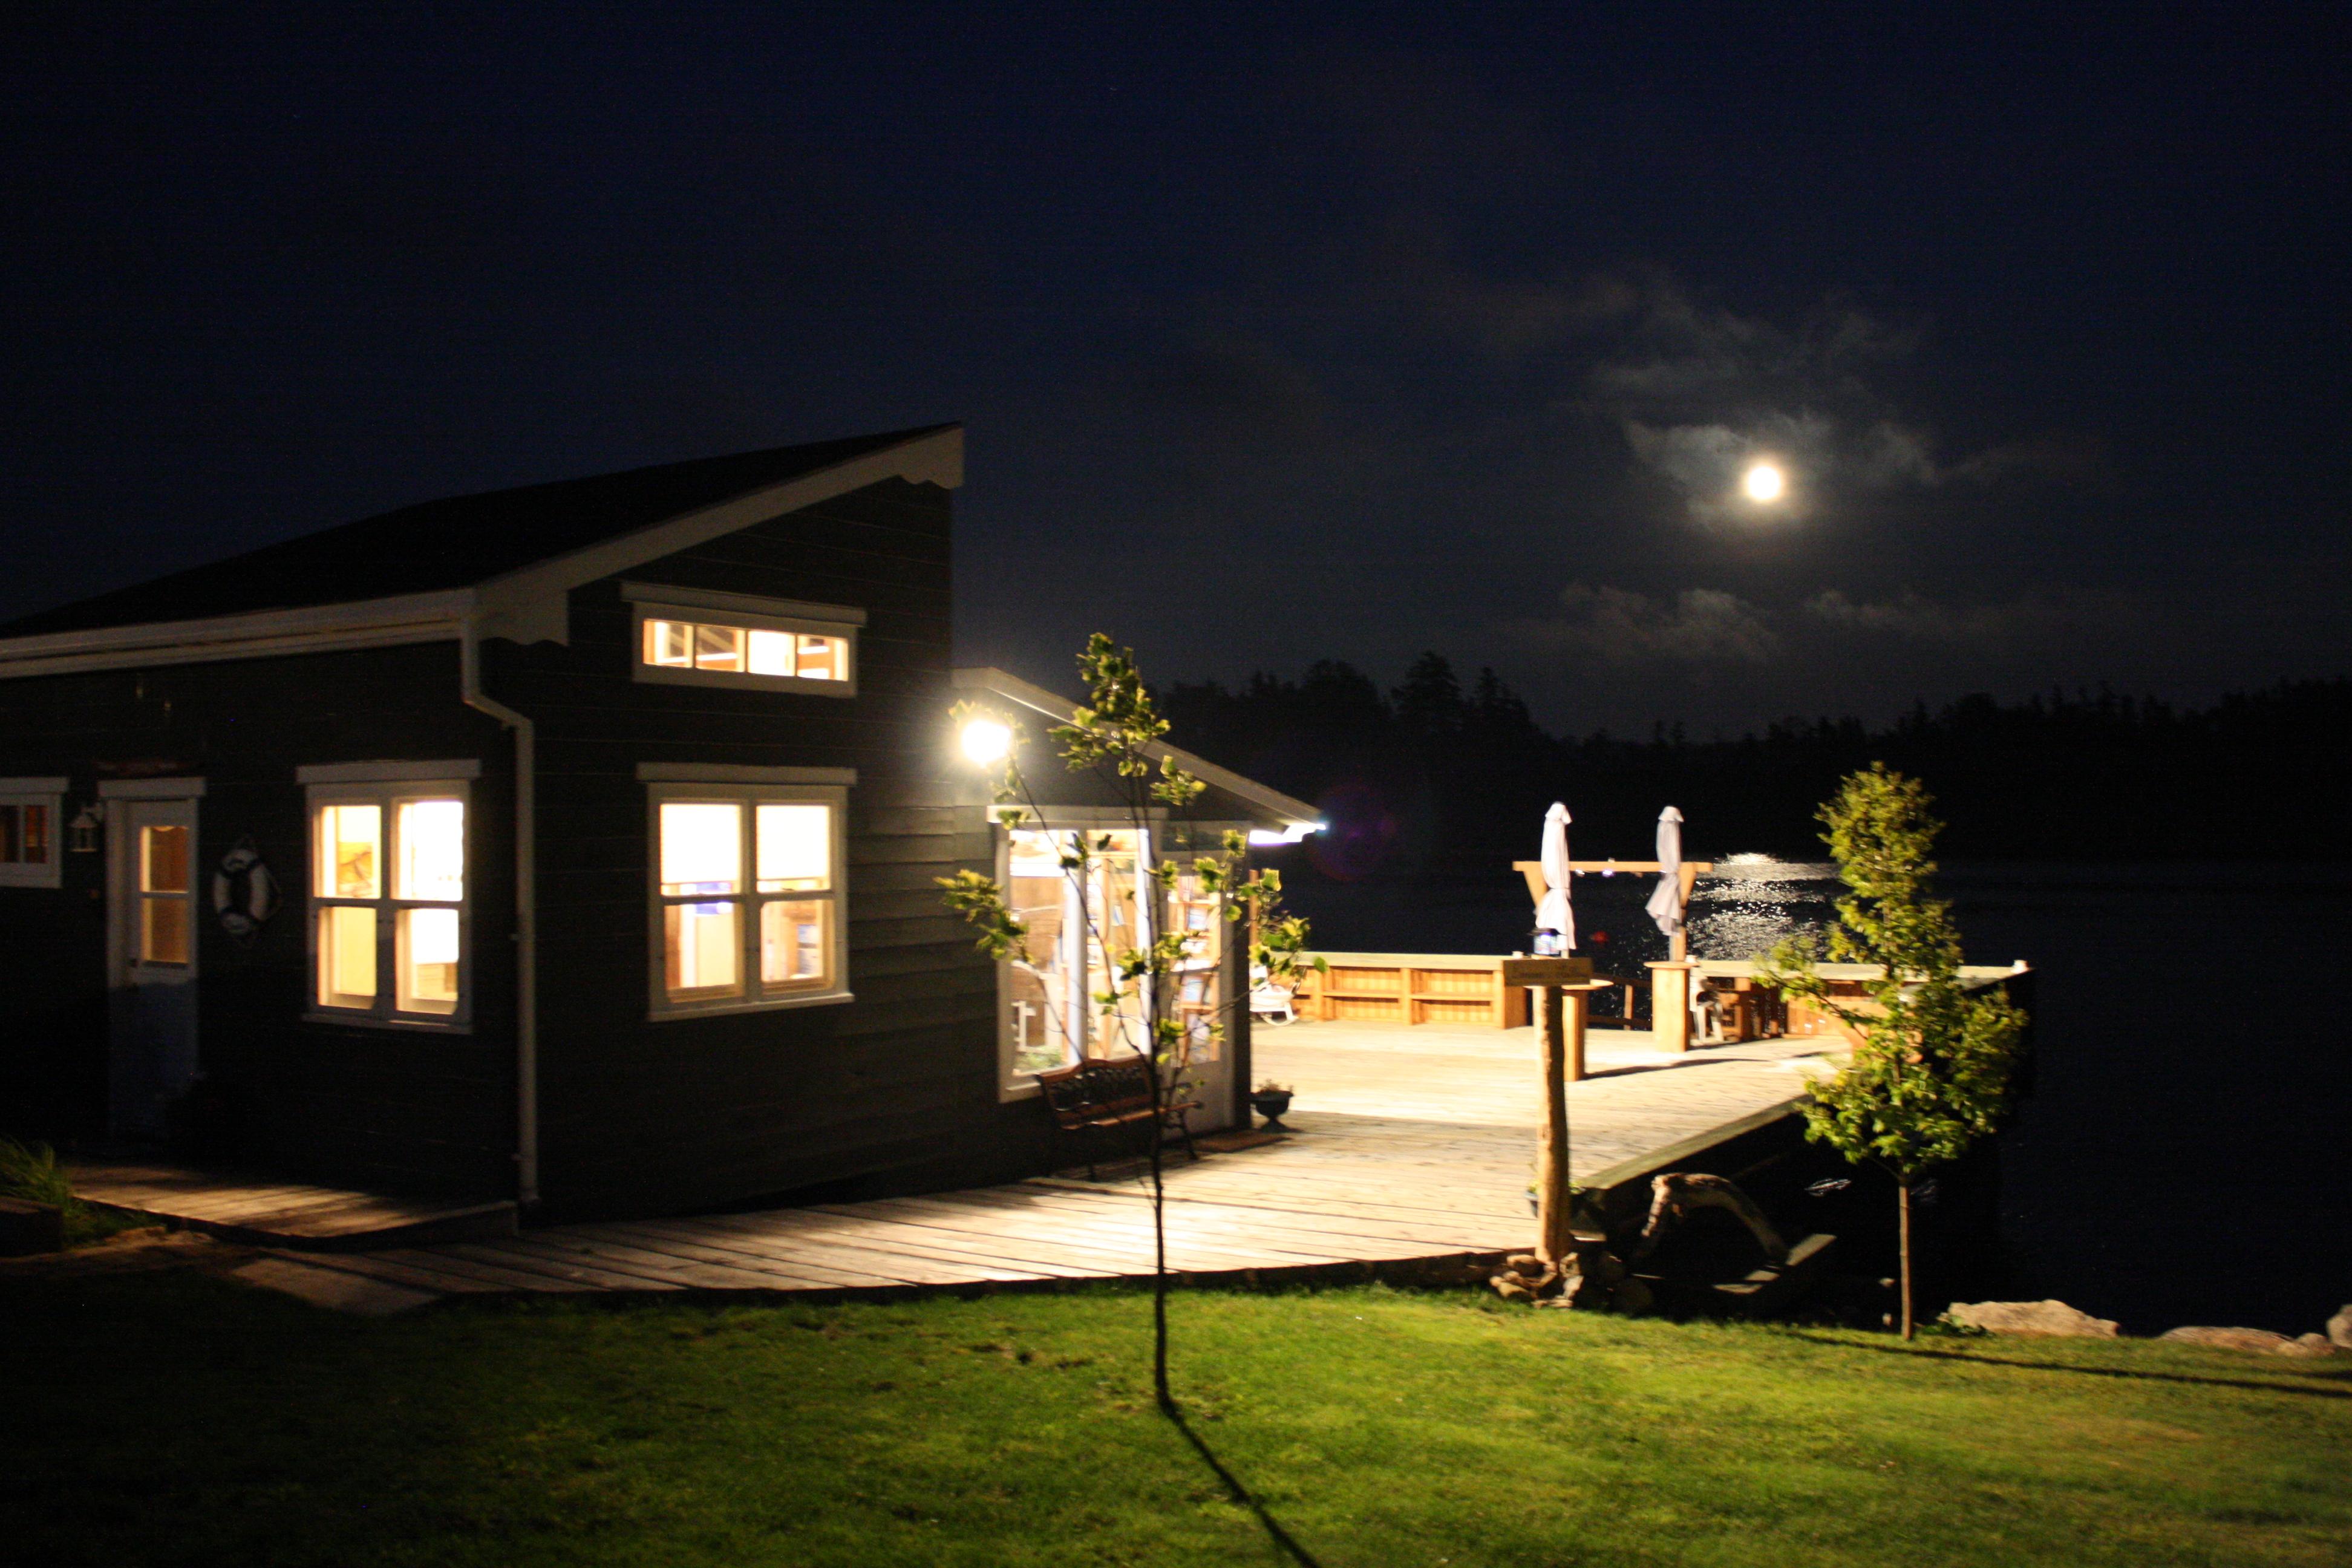 crystal friendly jayne s rentals deerview beach cottages kid vernon muskoka lake canada on luxury cottage jaynes